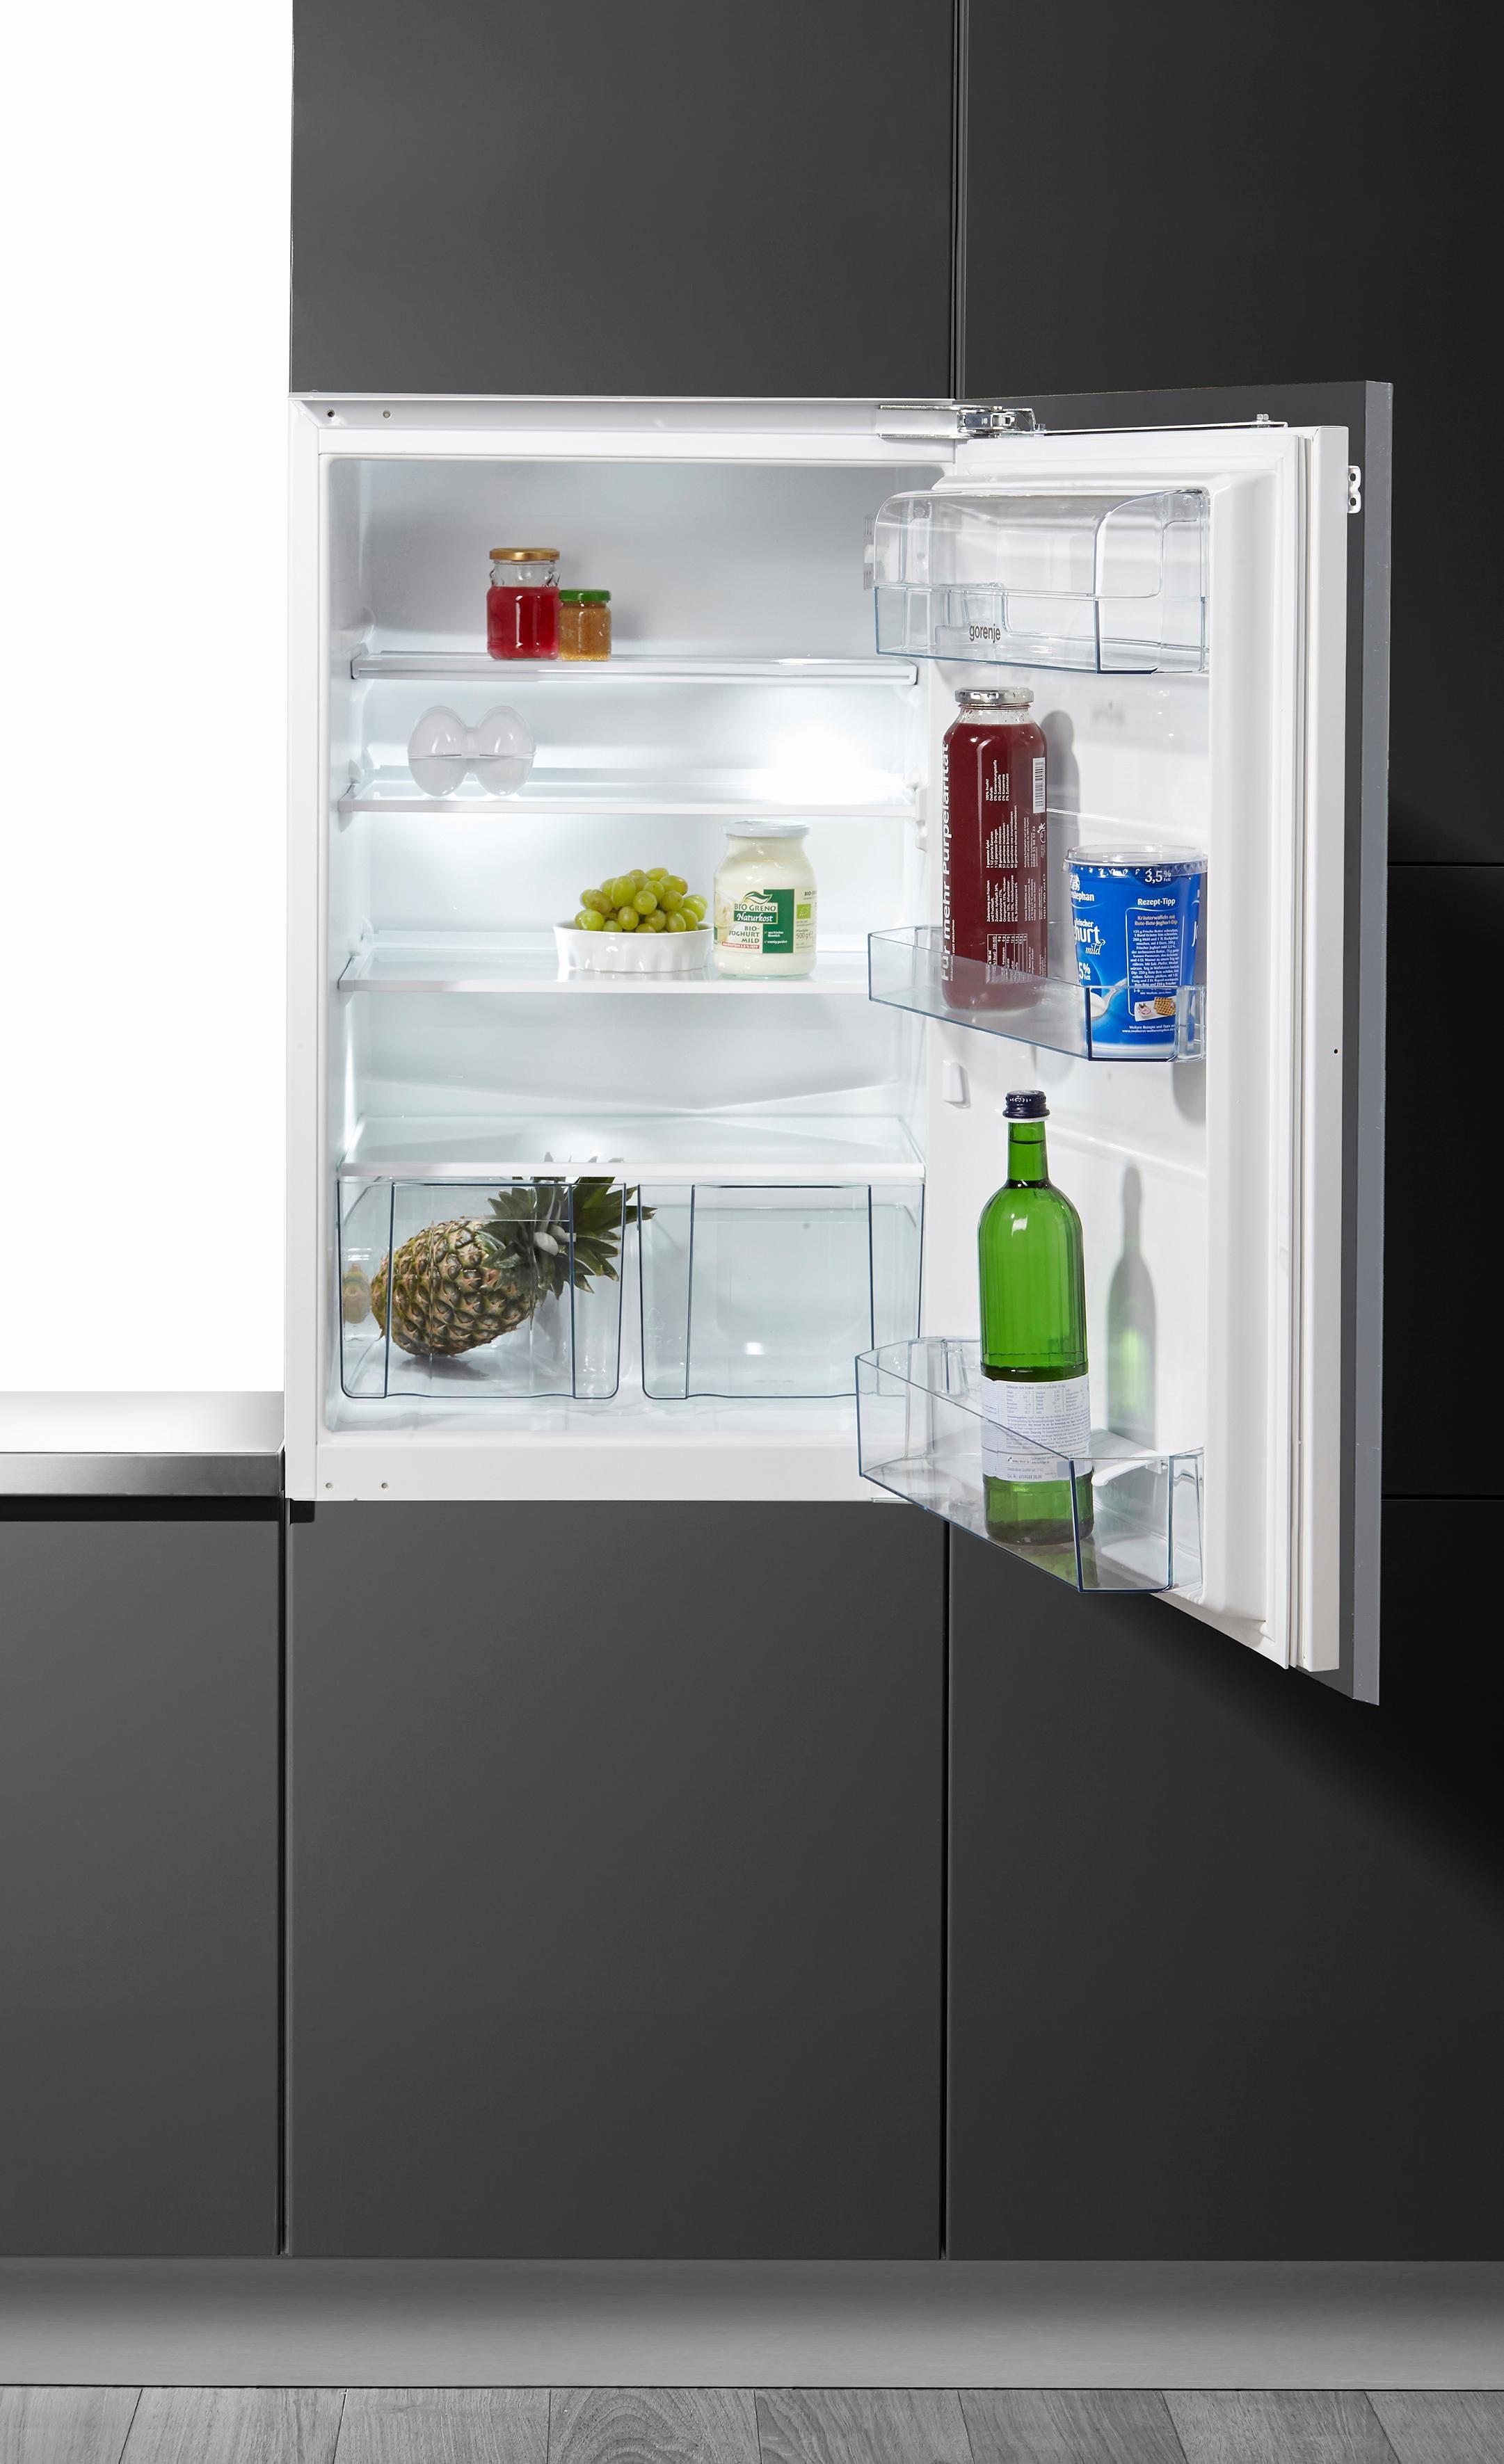 GORENJE Einbaukühlschrank RI 5092 AW, 87,5 cm hoch, 54 cm breit, A++, 87,5 cm, integrierbar